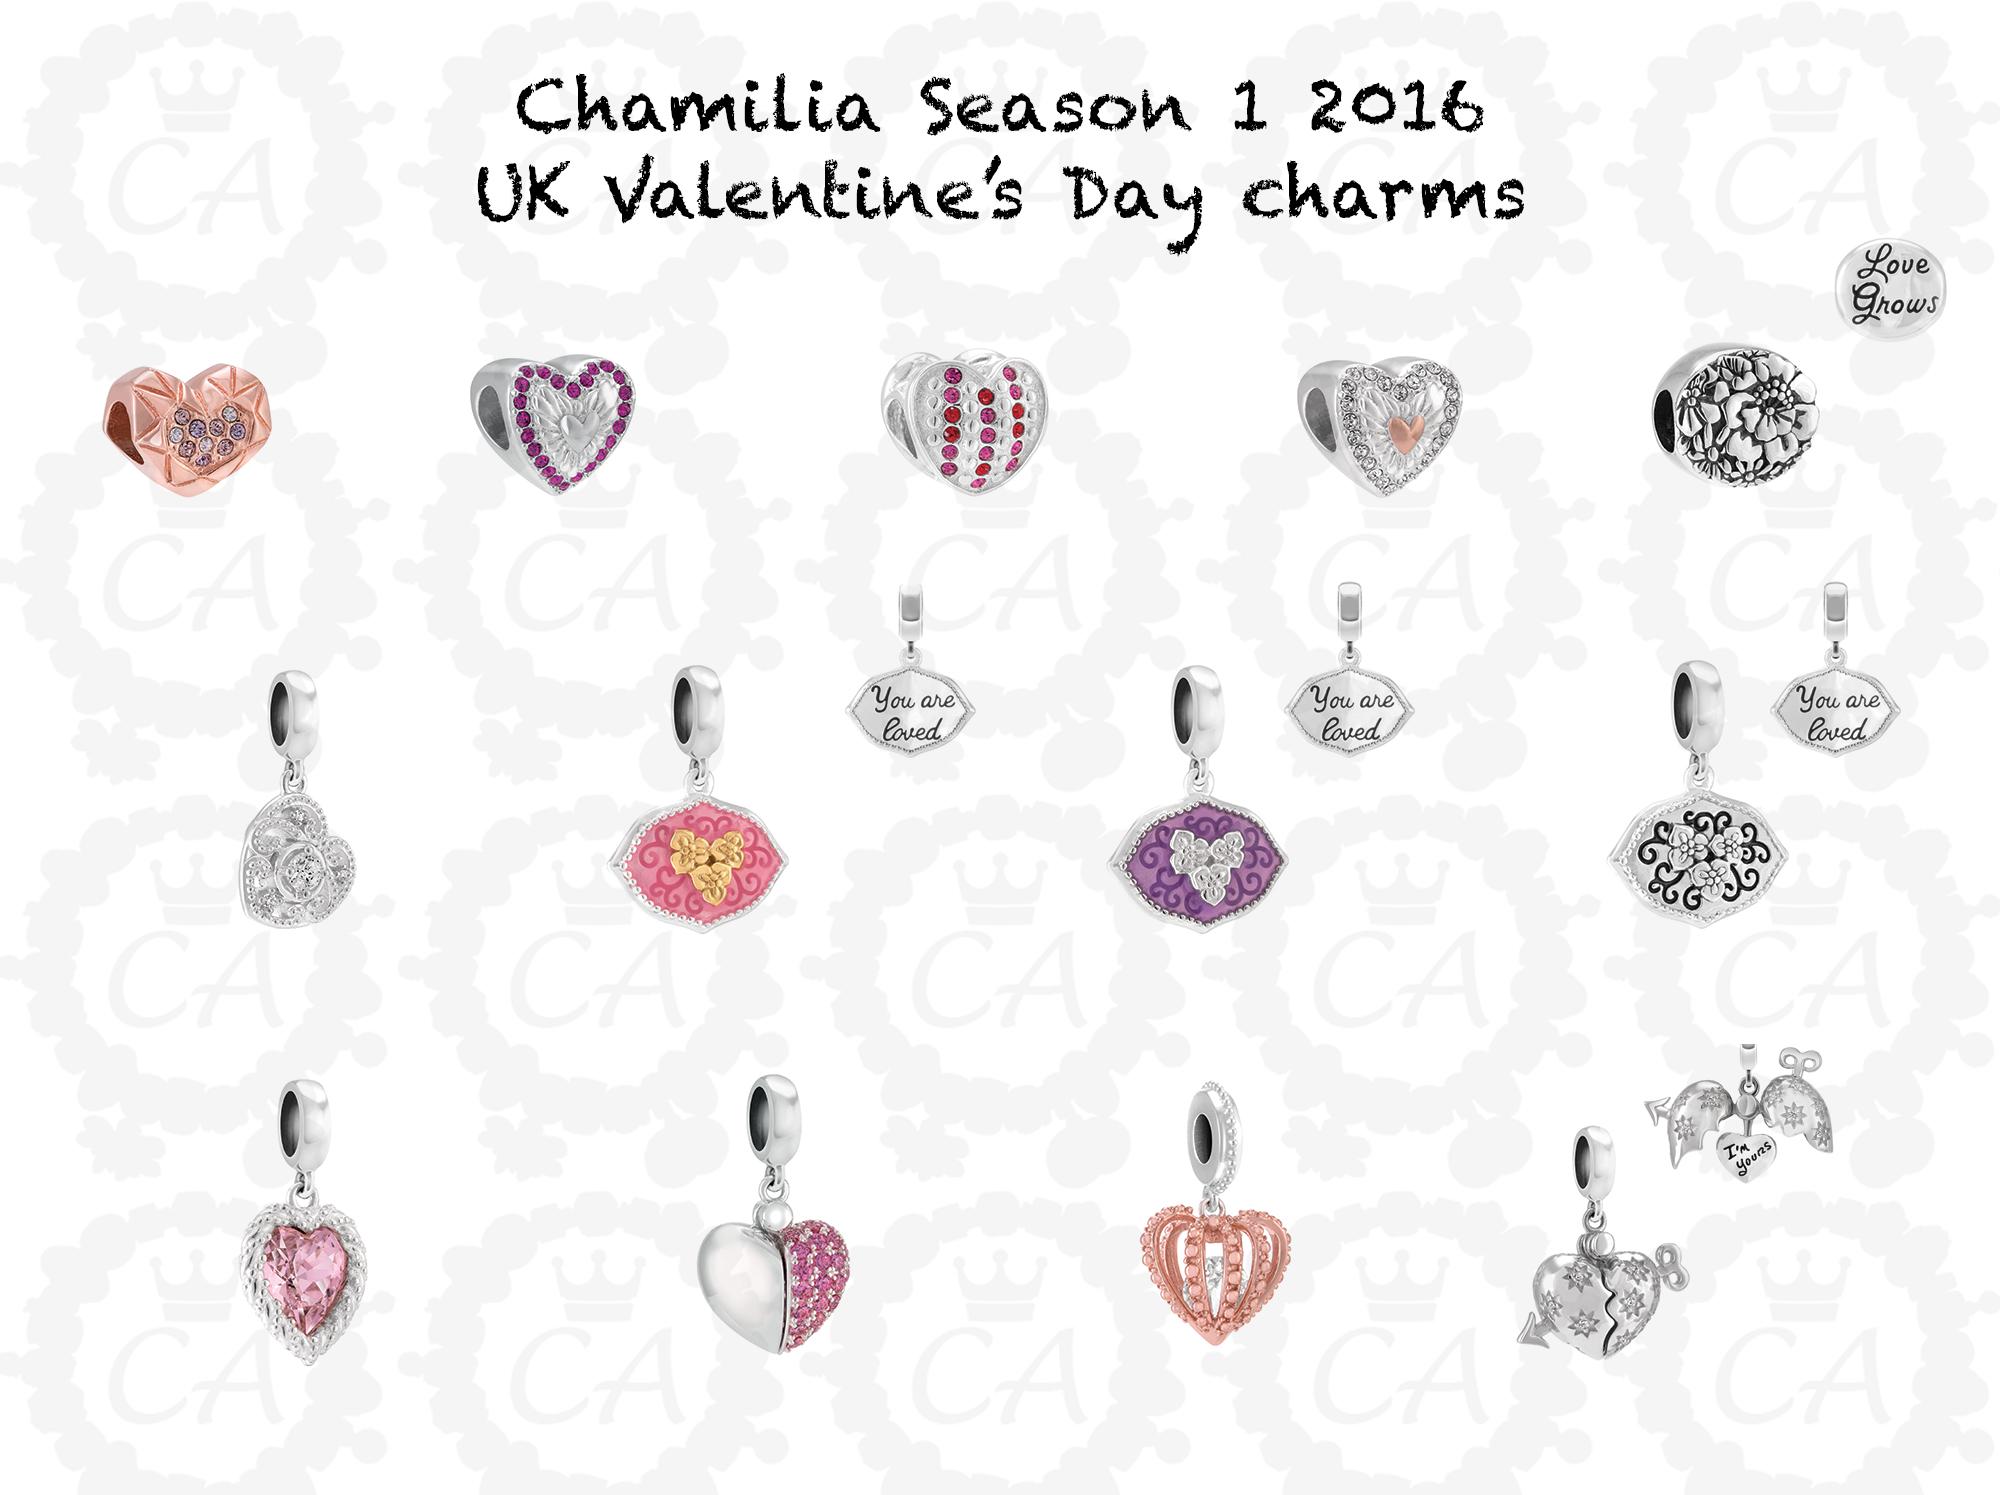 Chamilia Season 1 2016 European Preview Charms Addict